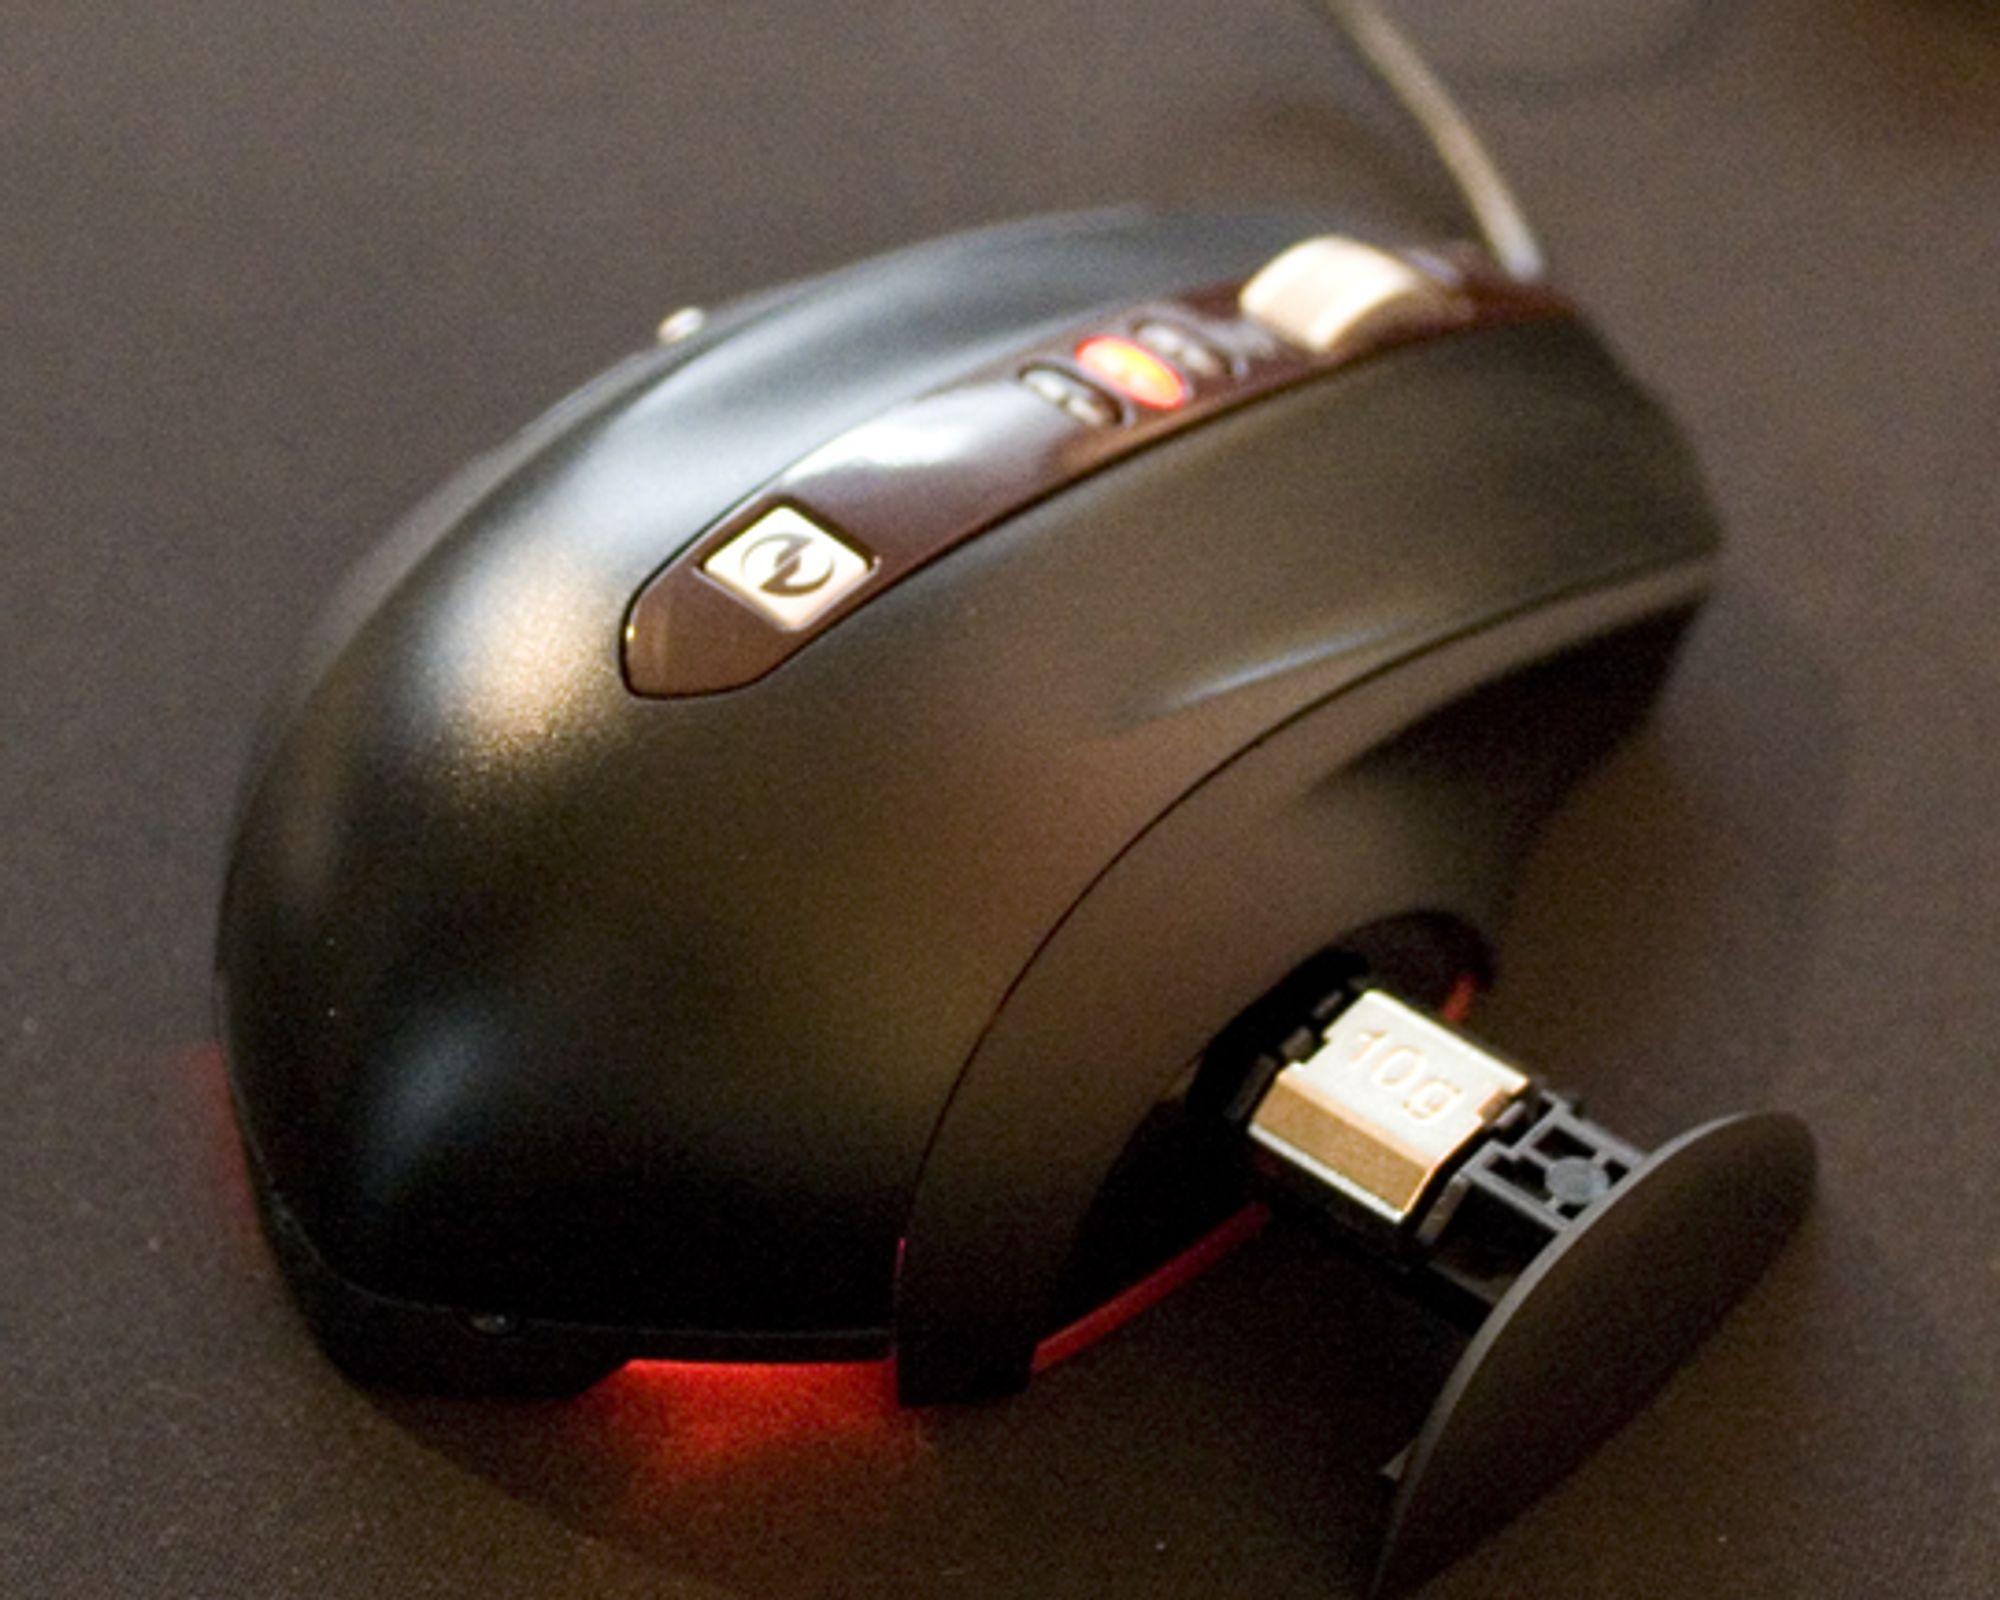 <em>SideWinder Mouse med vektbrettet ute</em>